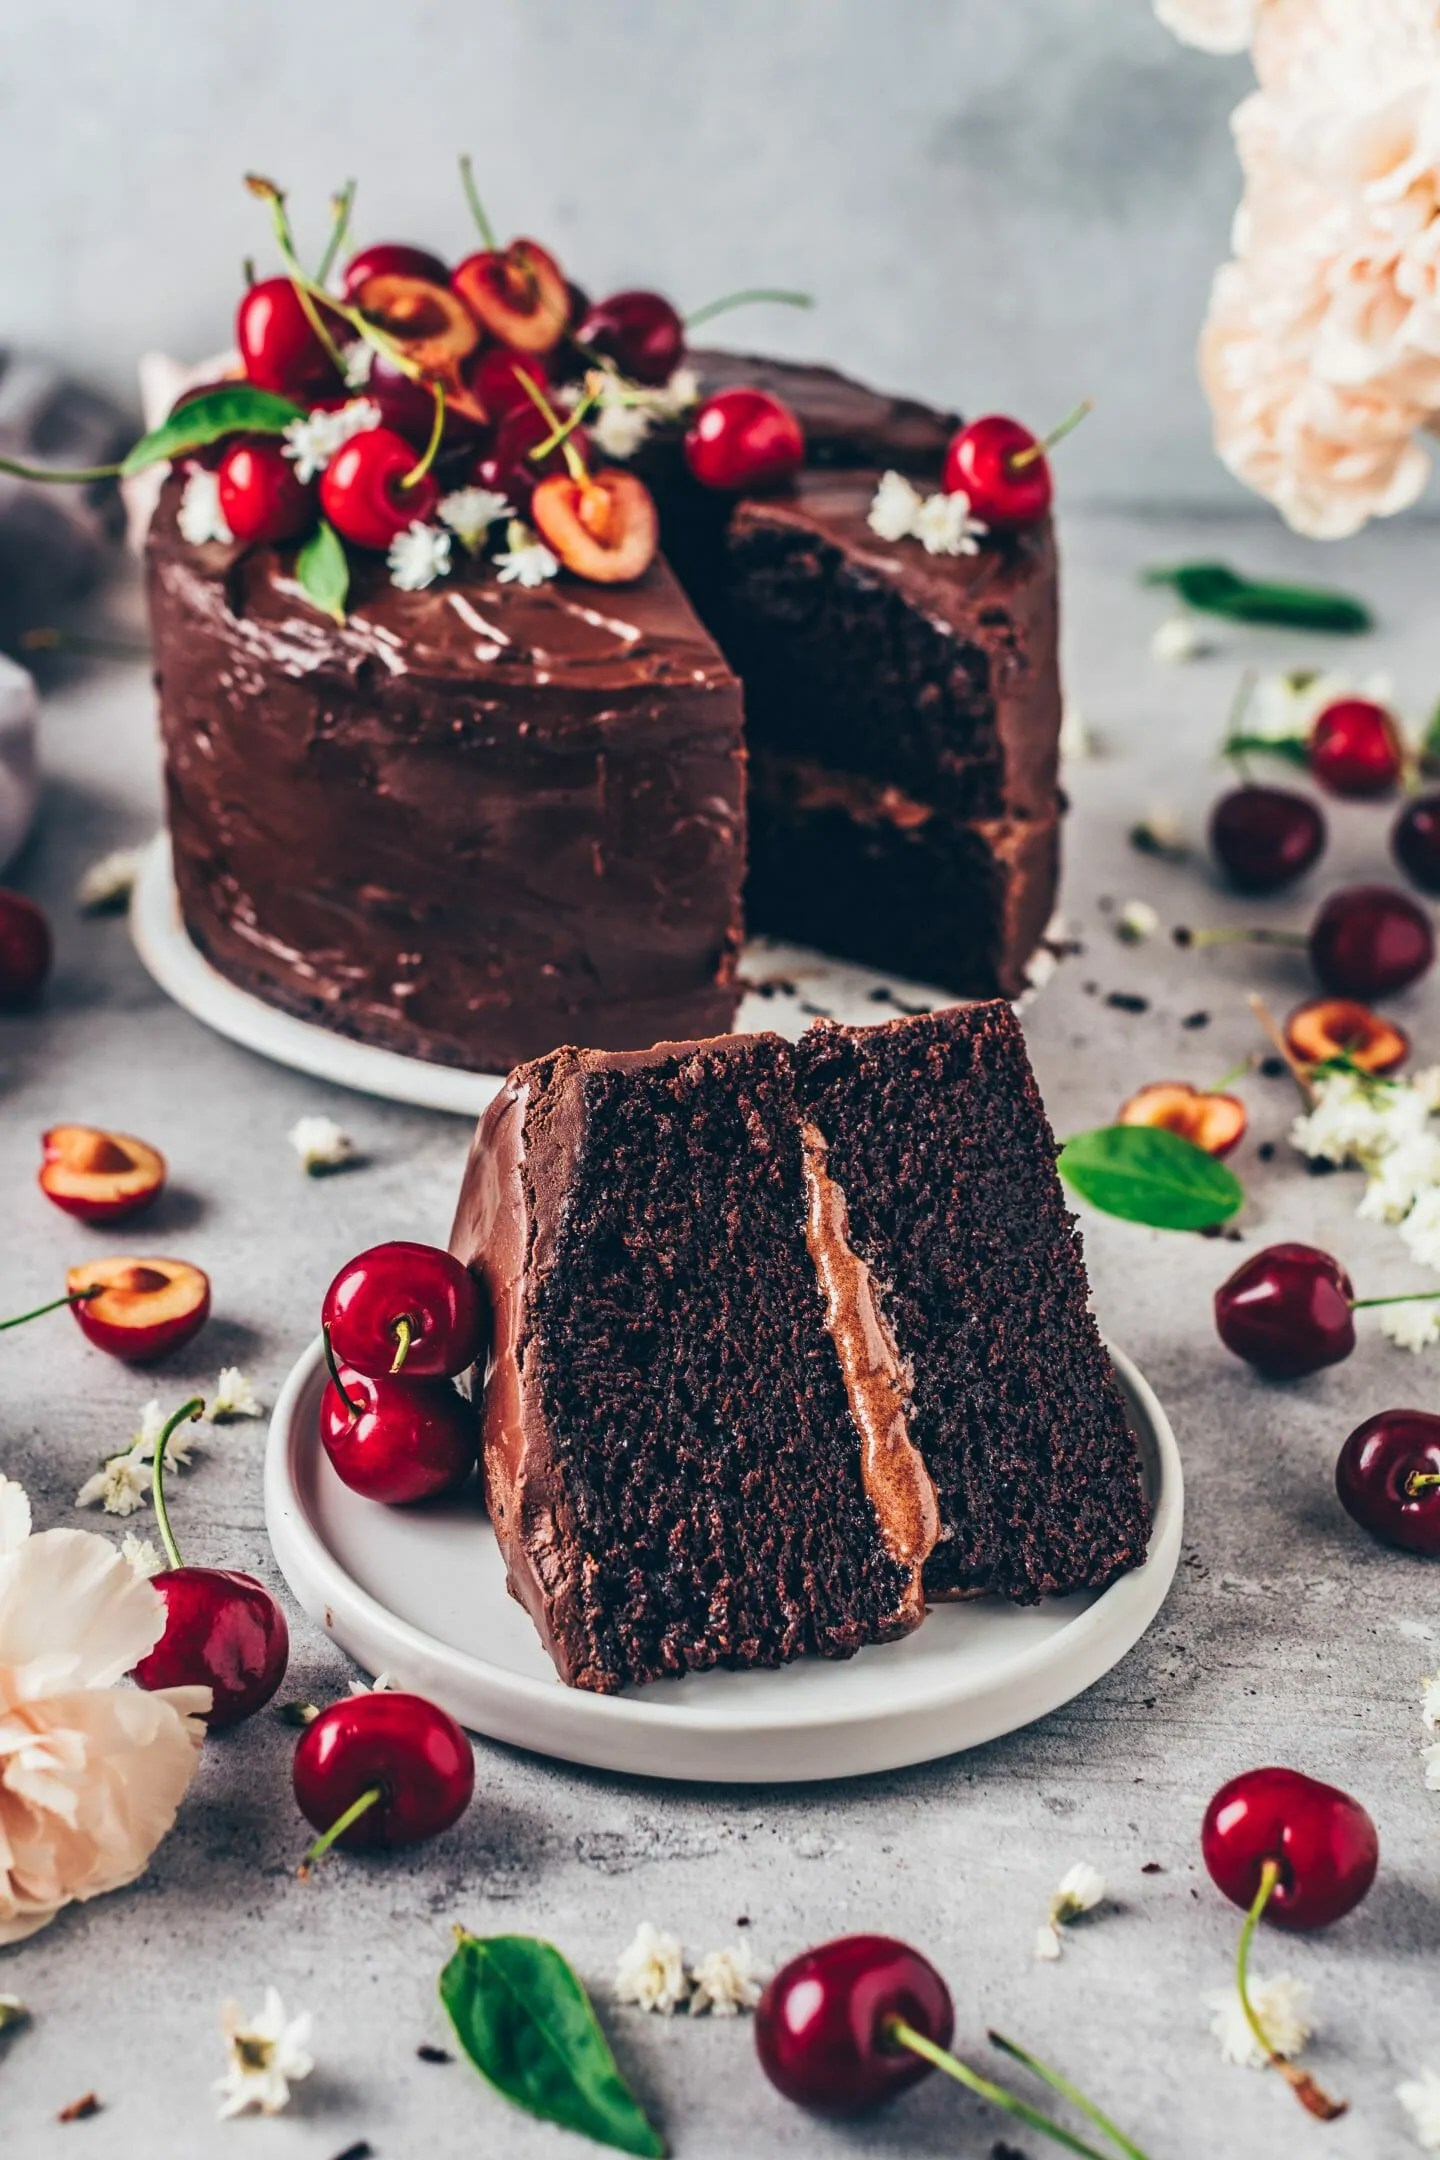 Best Vegan Chocolate Cake Easy Recipe Bianca Zapatka